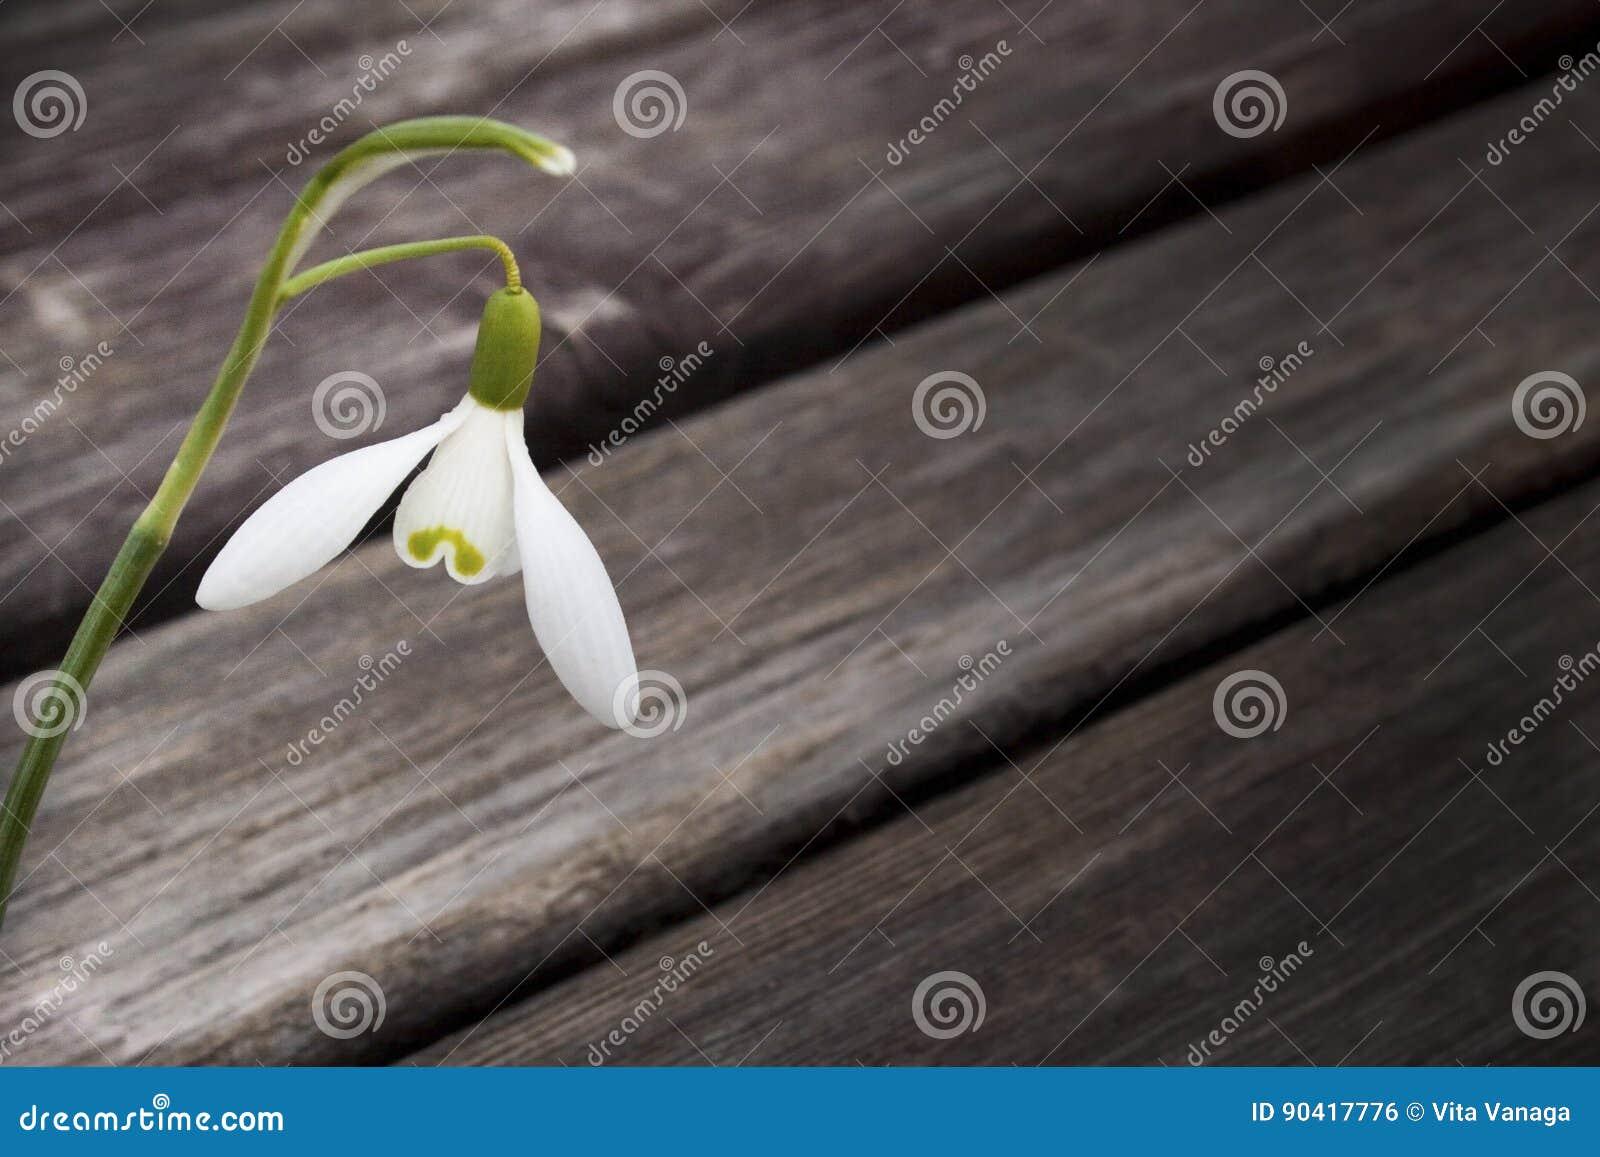 Vit snowbellcloseup på trägrå bakgrund, tomt utrymme, klart enkelhetsvårlynne